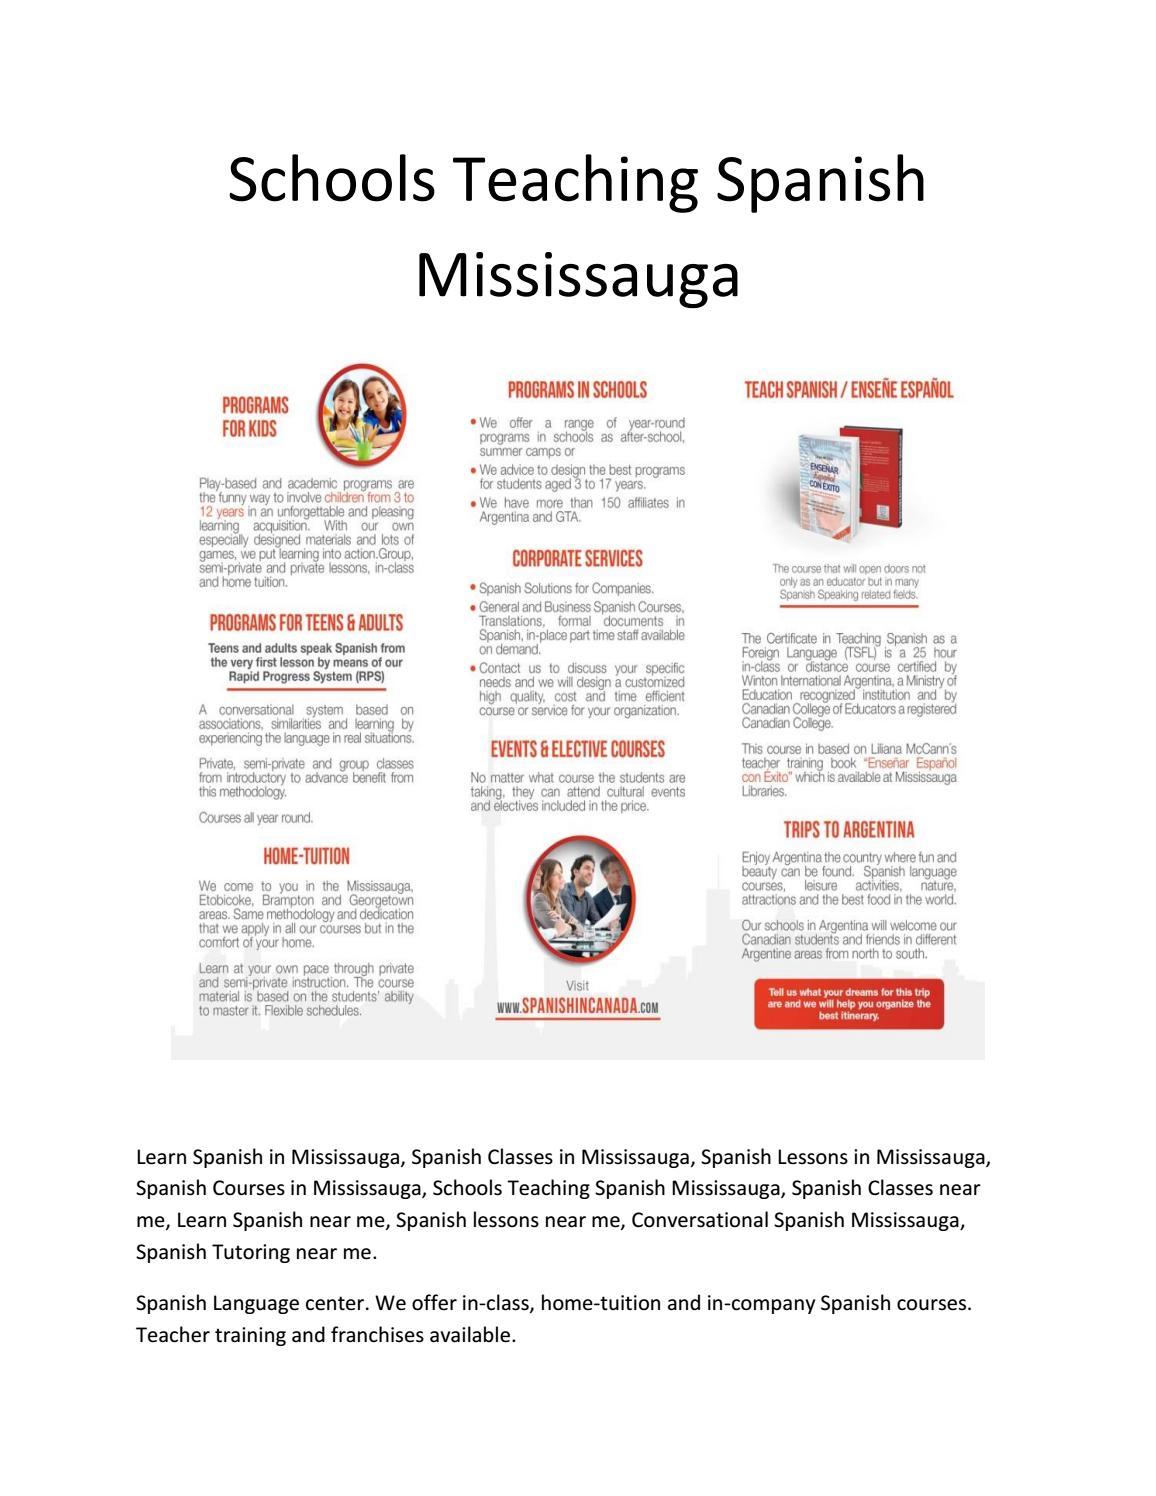 Schools teaching spanish mississauga by Liliana McCan - issuu